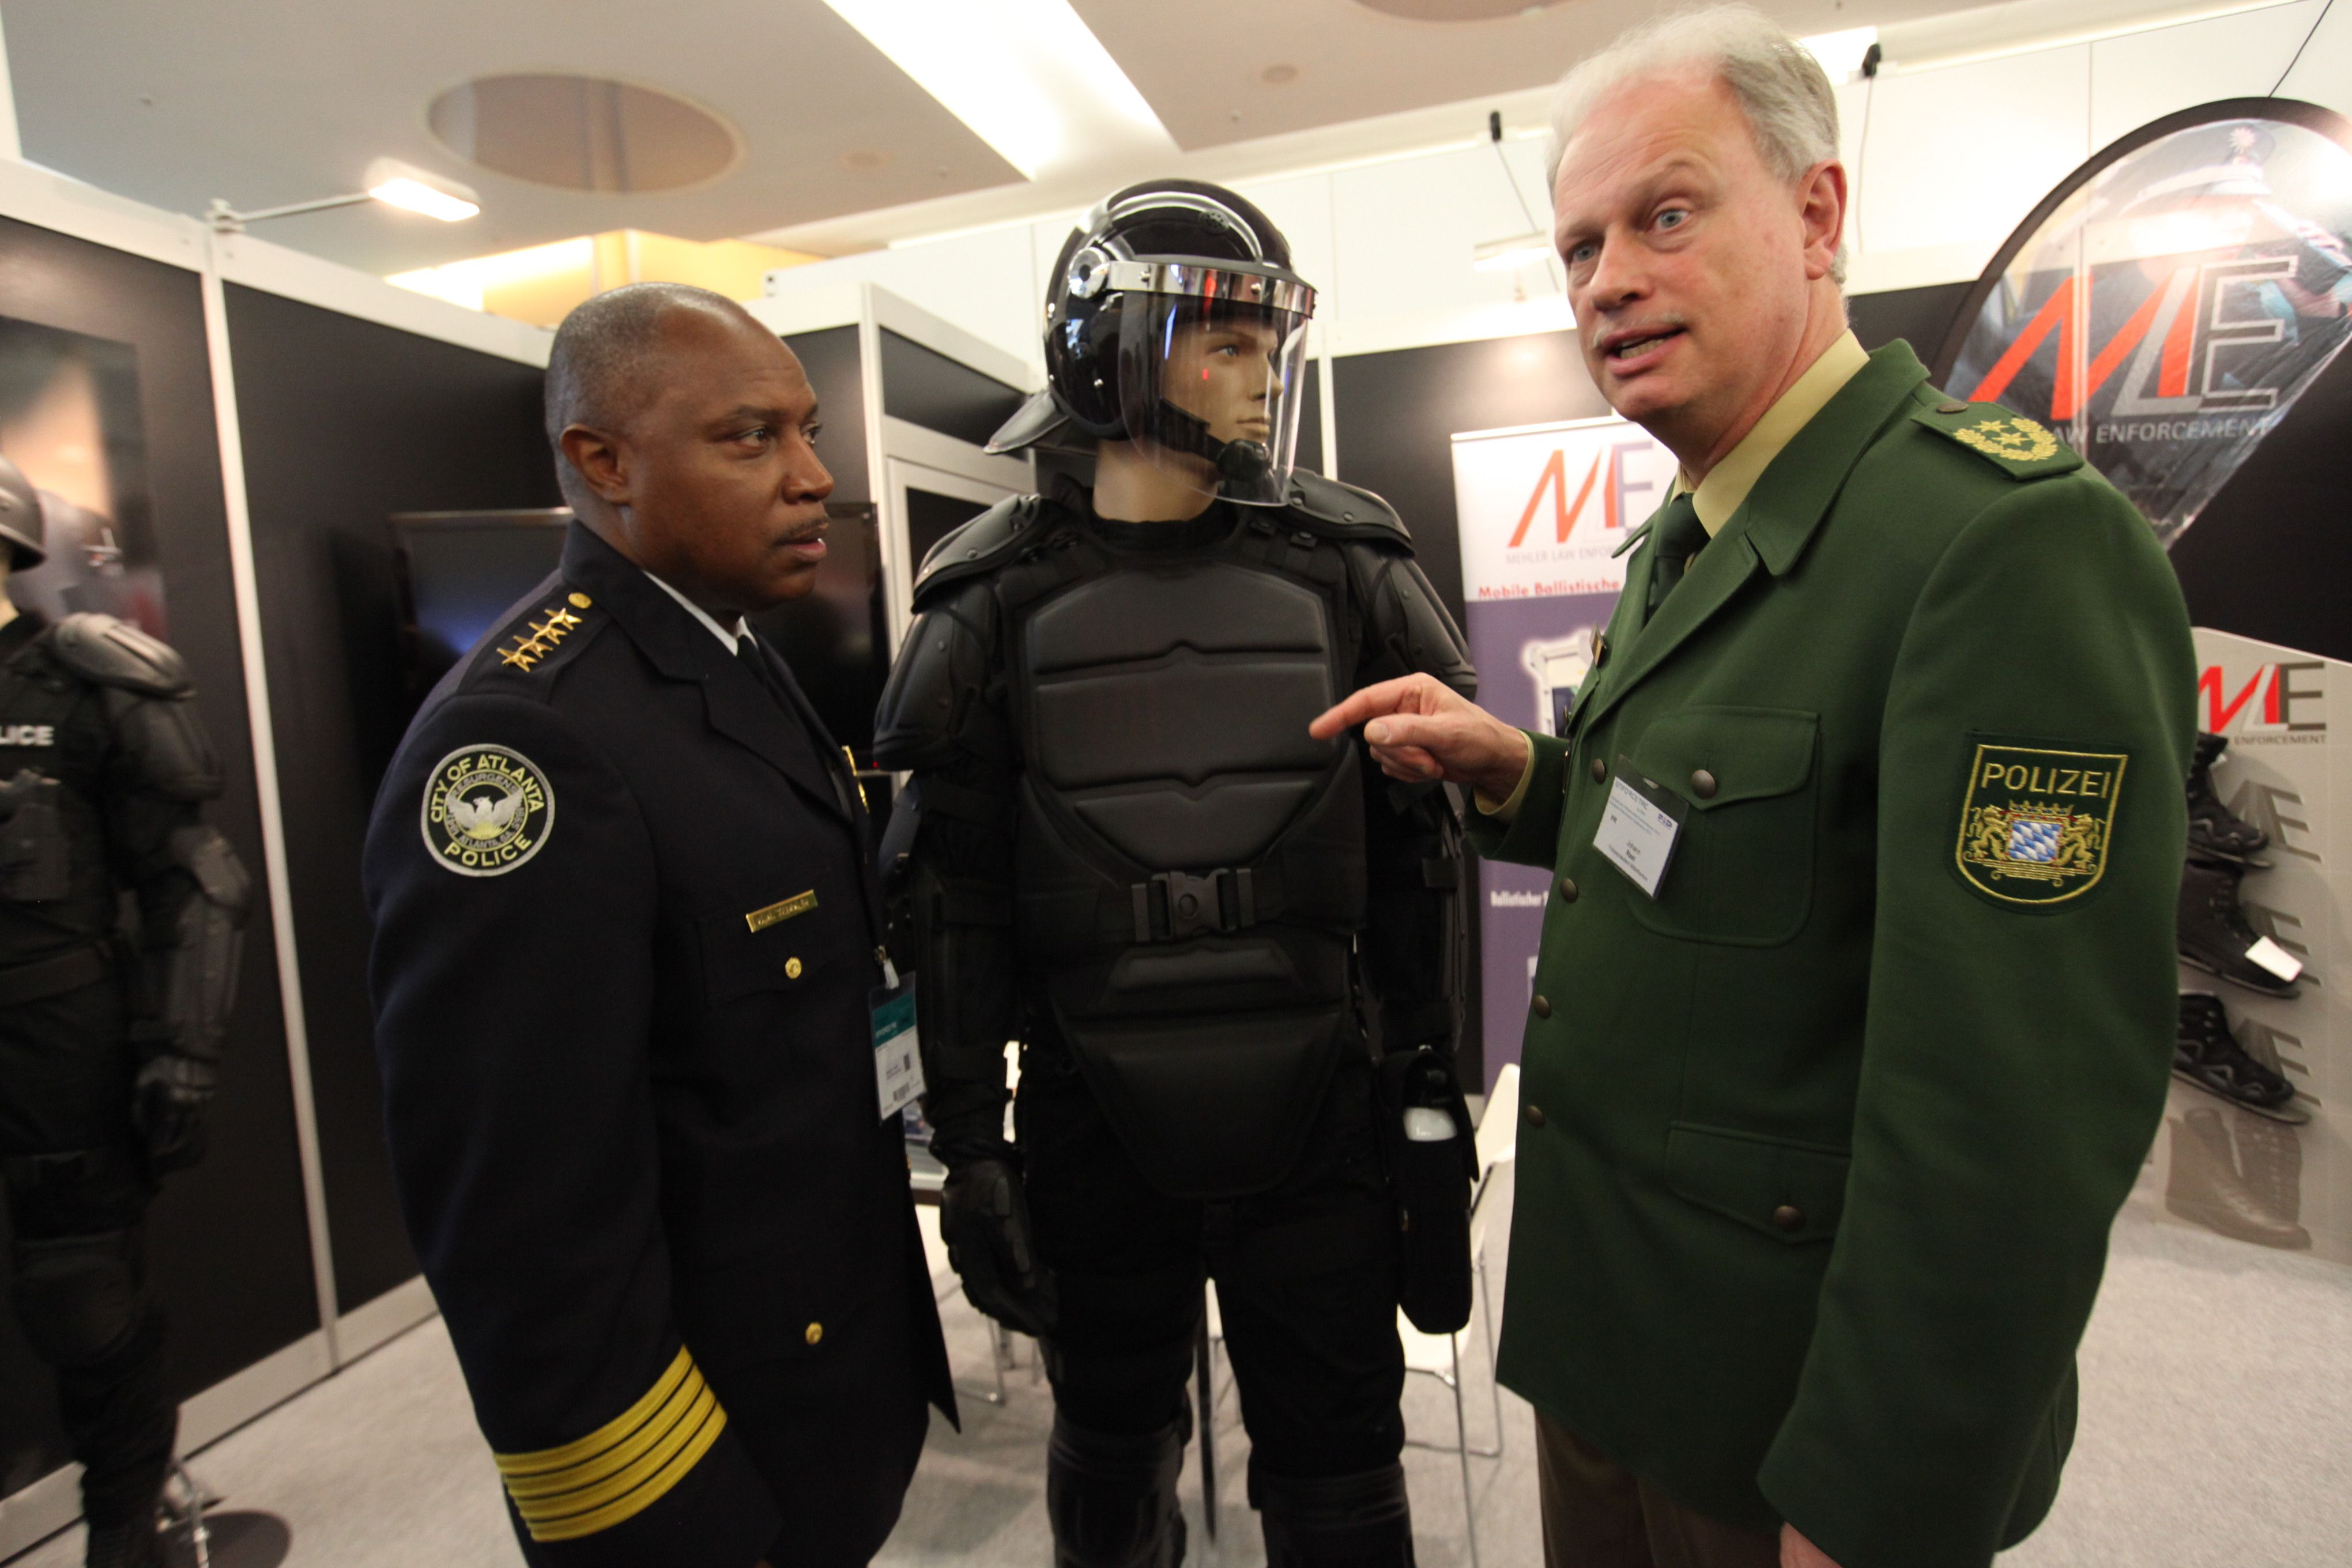 ATL Police Chief Visits Nuremberg